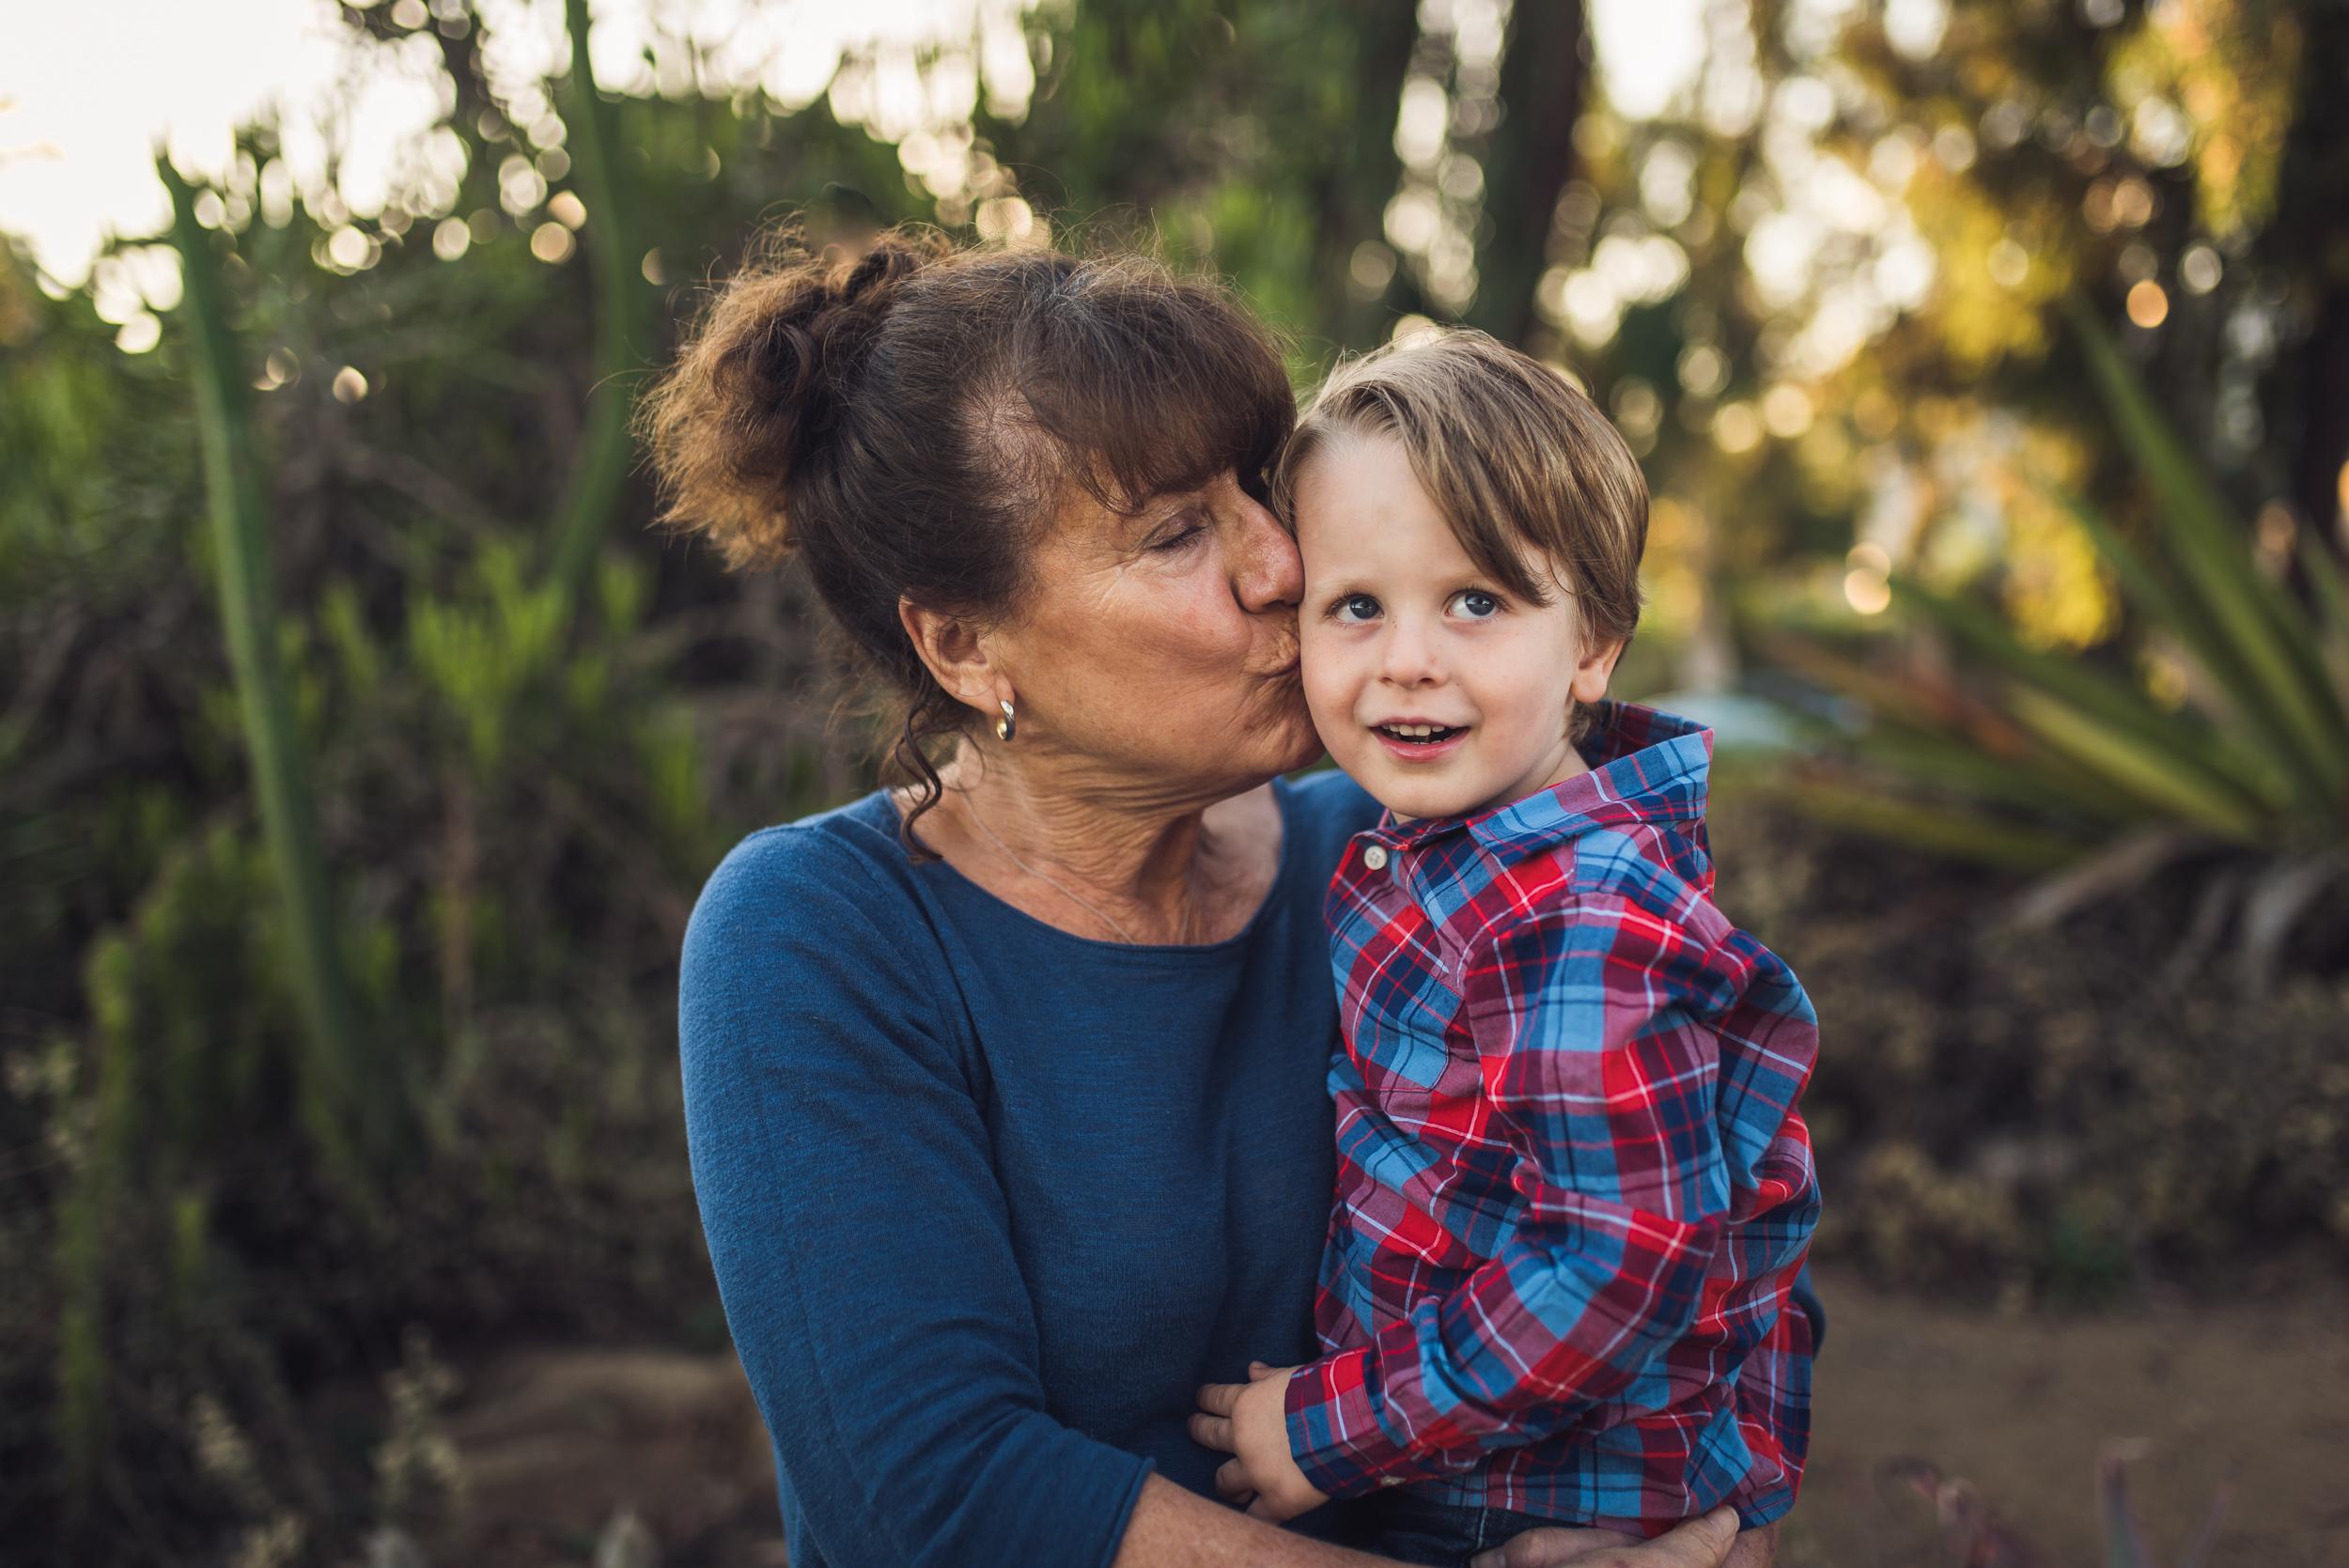 2018-San-Diego-Family-Lifestyle-Newborn-Travel-Vacation-Photographer-Kelsey-Smith-Photography-Coronado-La-Jolla-Encinitas-Solana-Beach-Del-Mar-175.jpg